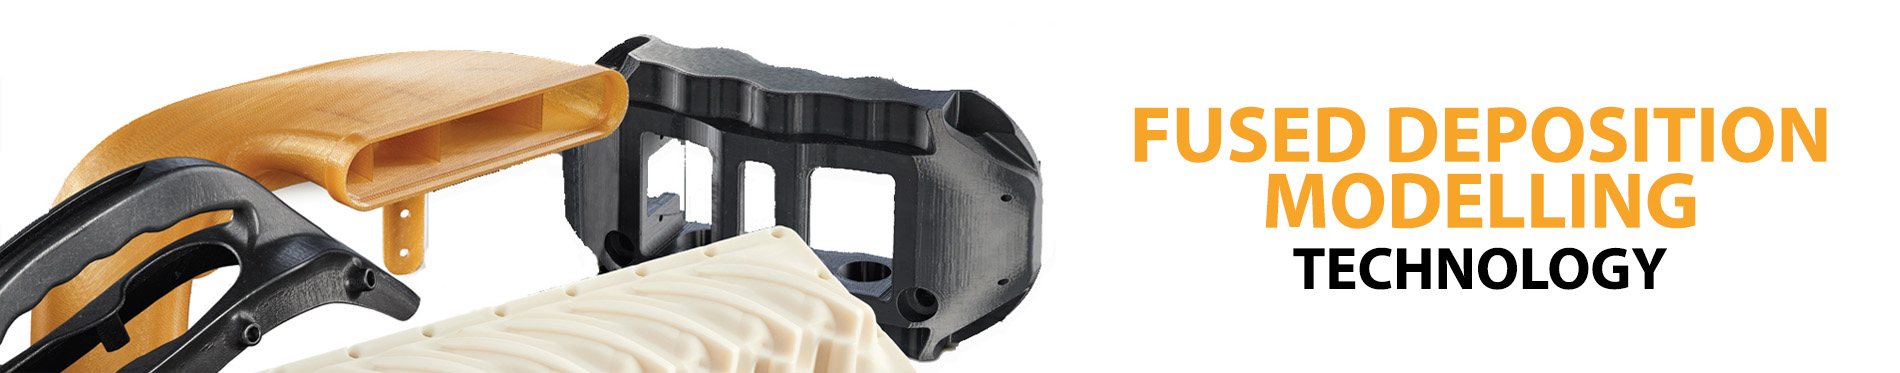 stratasys fdm technology 3d printing